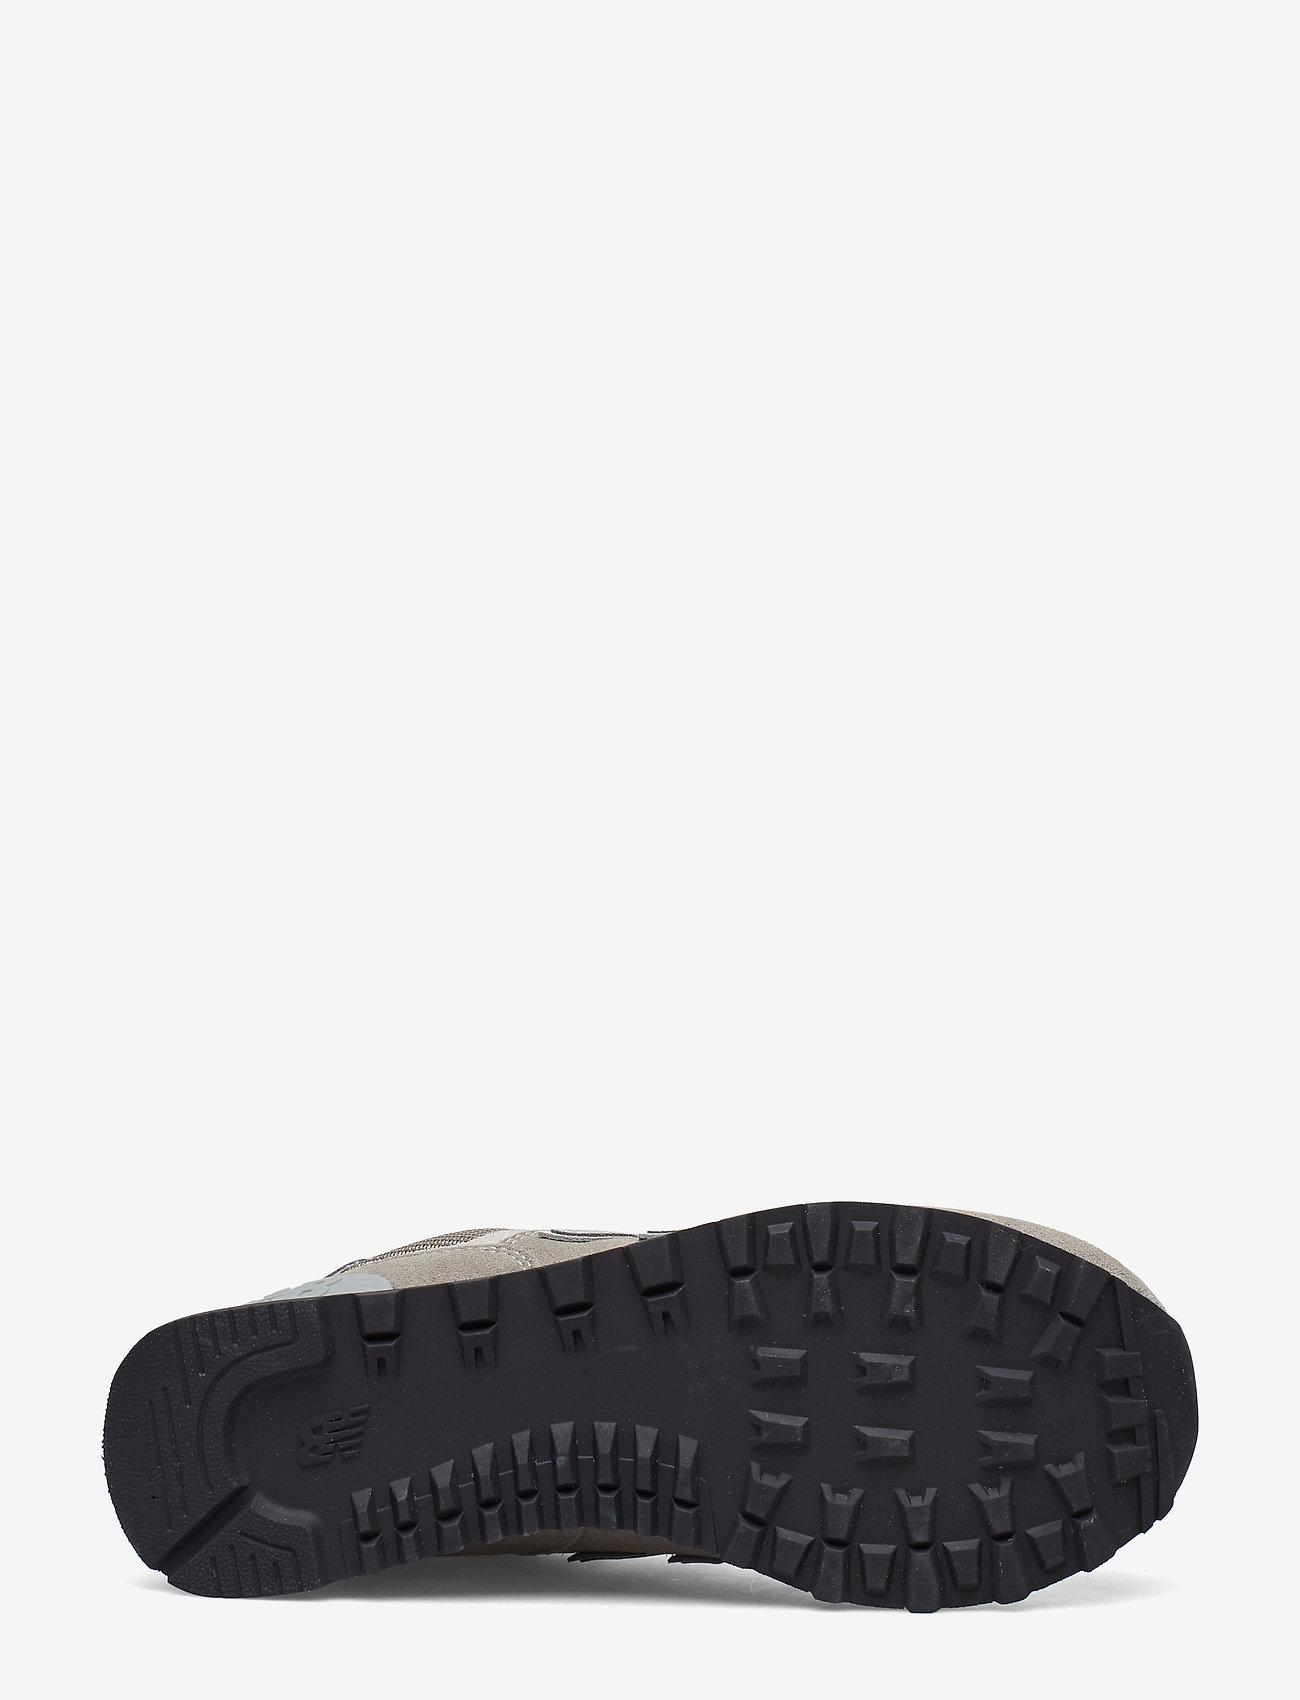 New Balance - WL574EG - low top sneakers - grey - 4